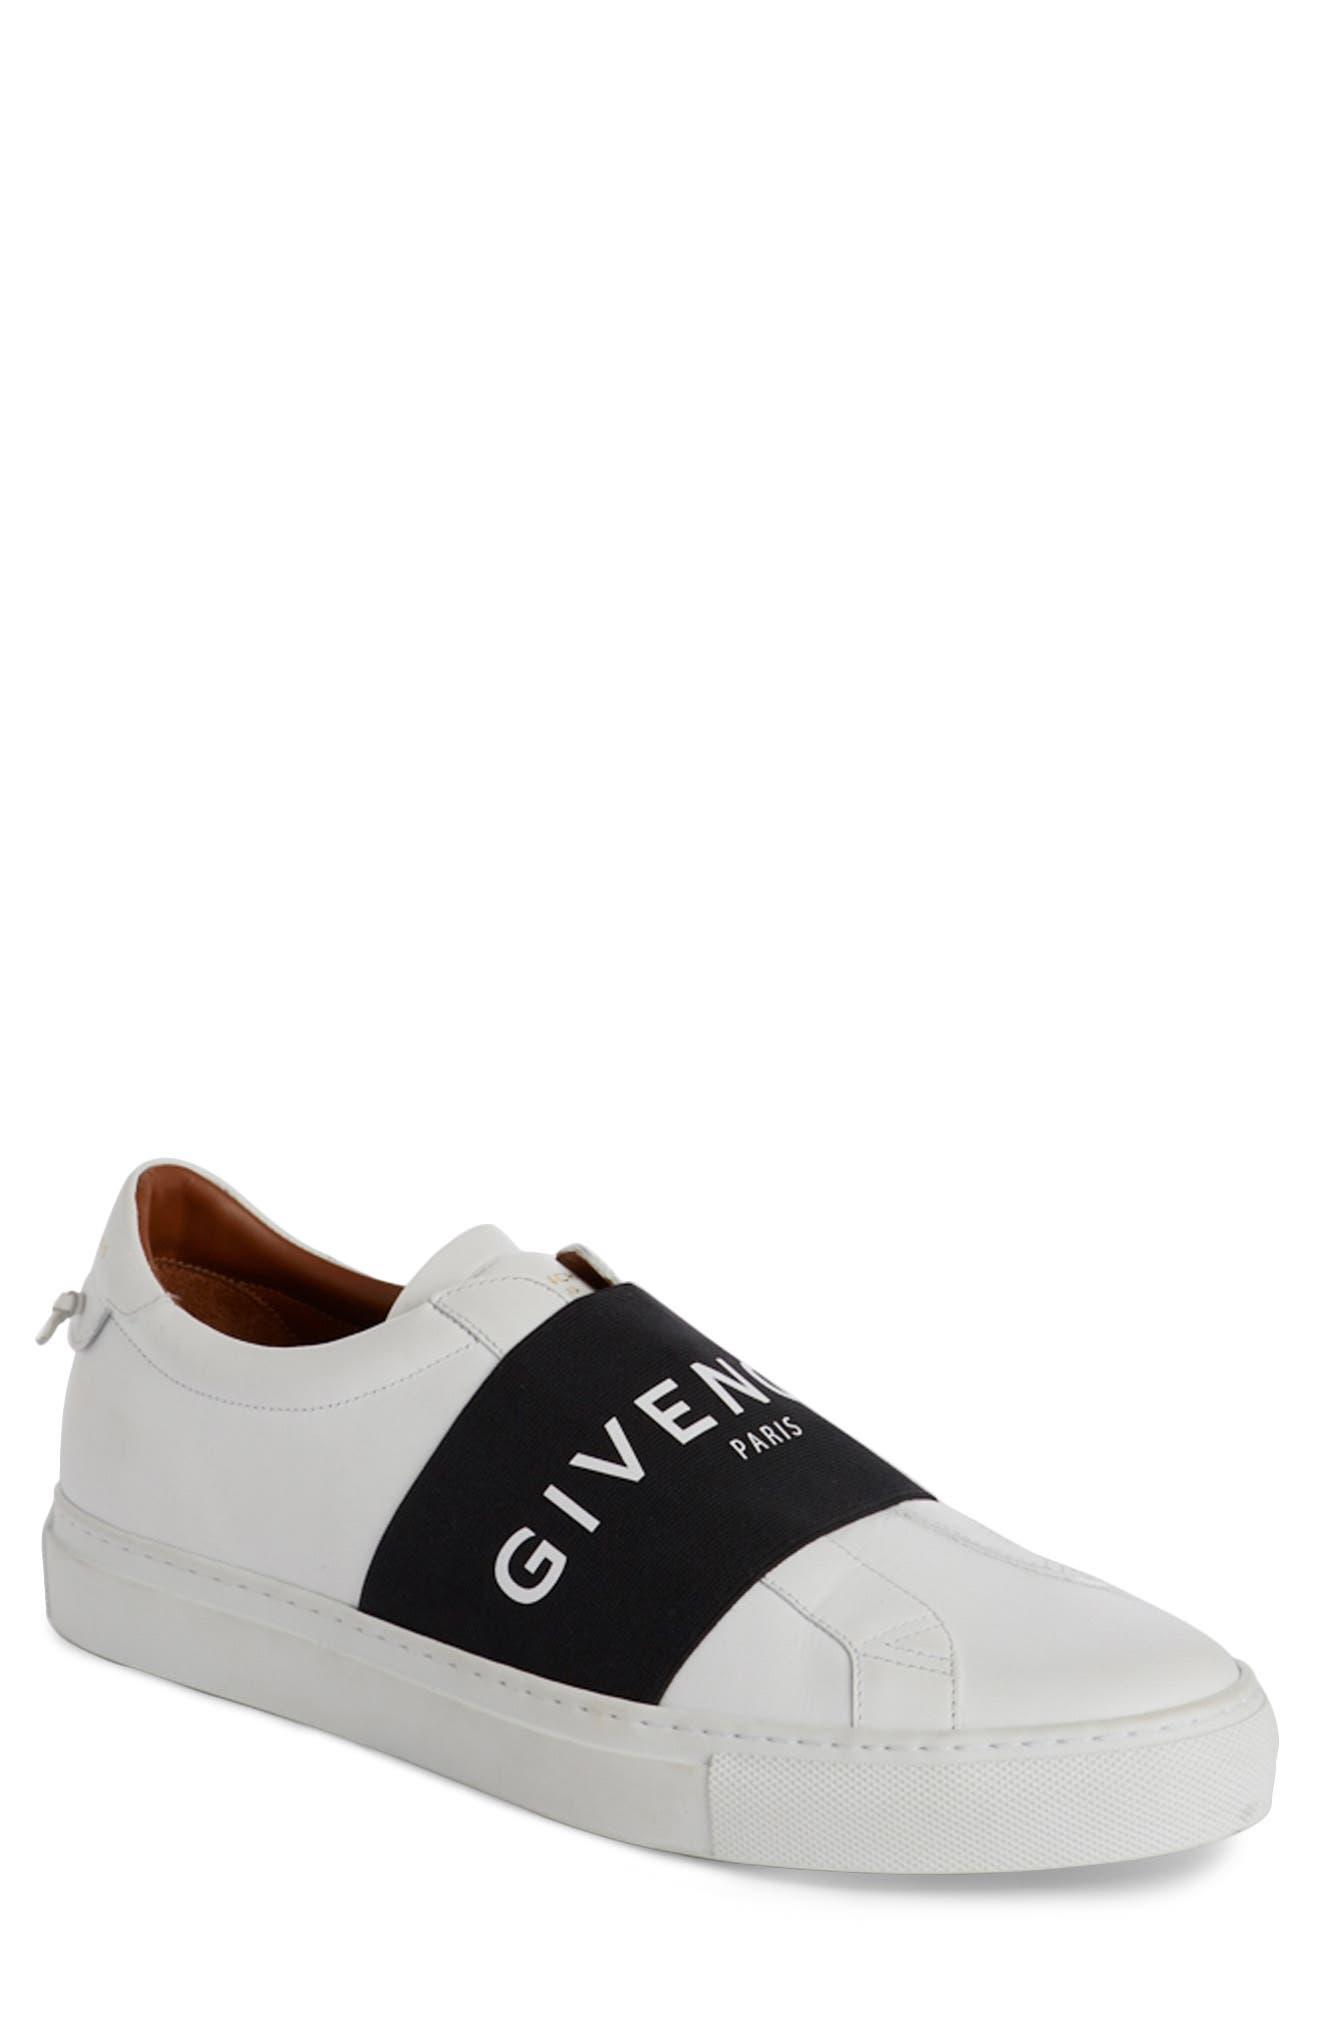 Logo Strap Slip-On Sneaker,                         Main,                         color, WHITE/ BLACK